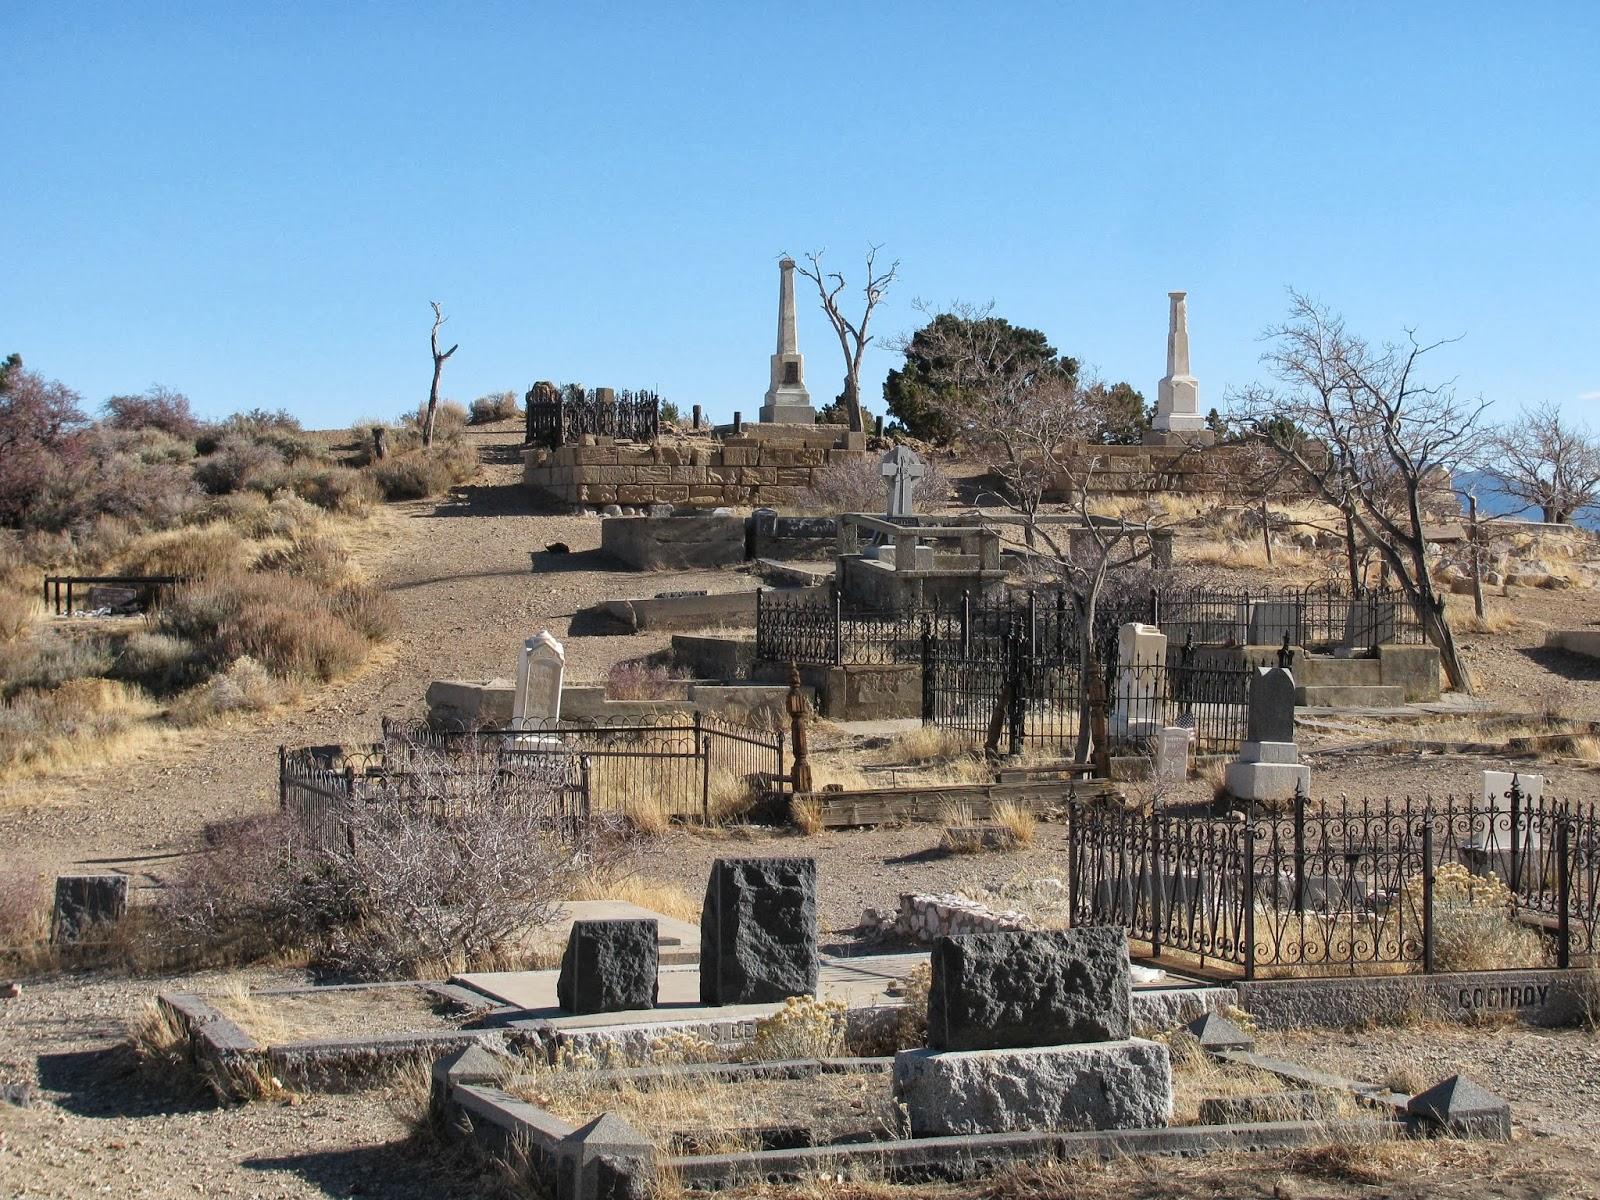 Nevada (MO) United States  city photos : Weekend Wanderluster: Virginia City Cemetery Storey County, Nevada